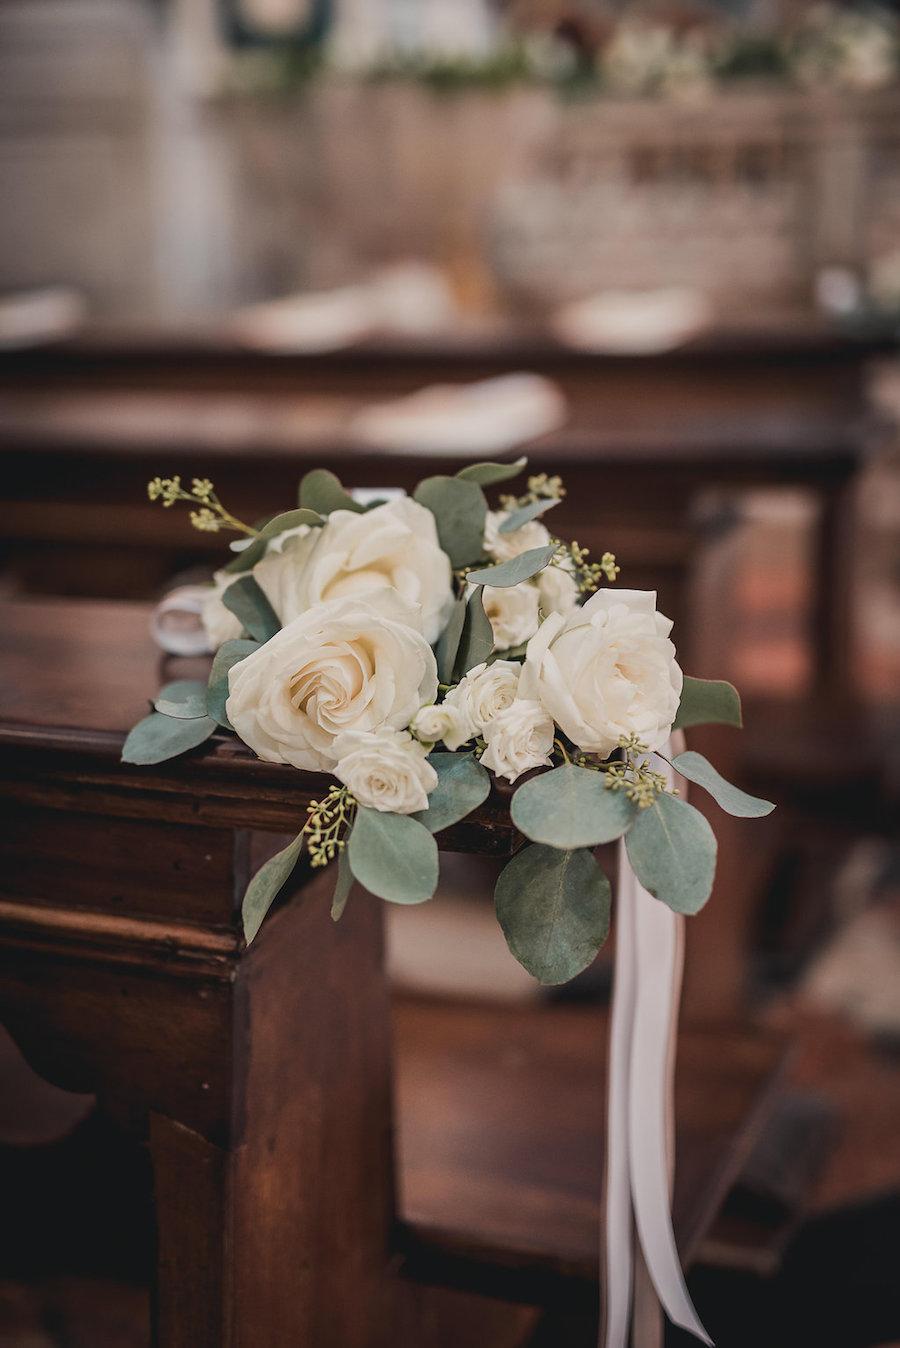 Matrimonio Tema Green : Un matrimonio ispirato ai viaggi a venezia wedding